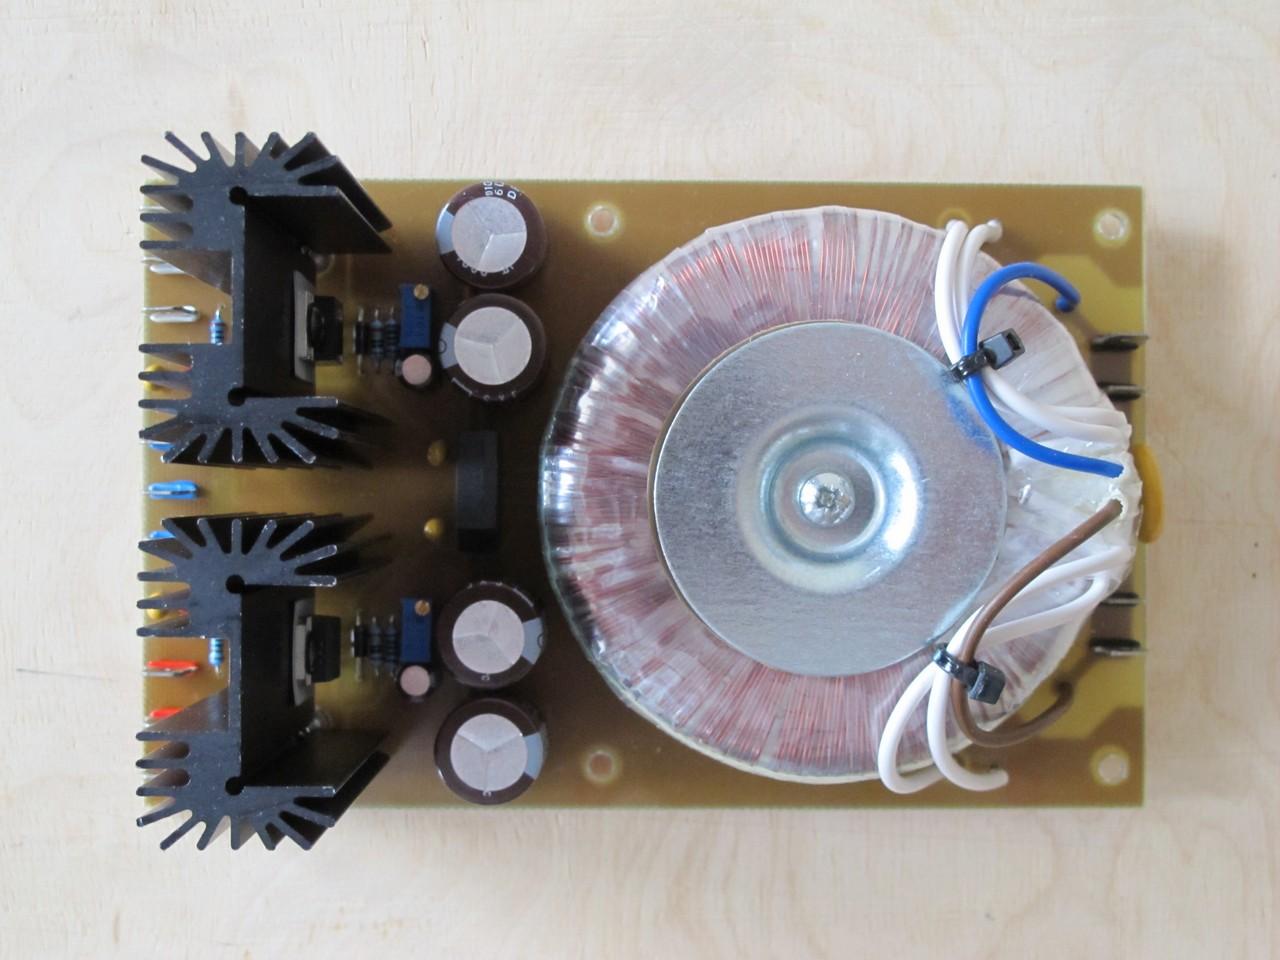 Modular synth PSU top view